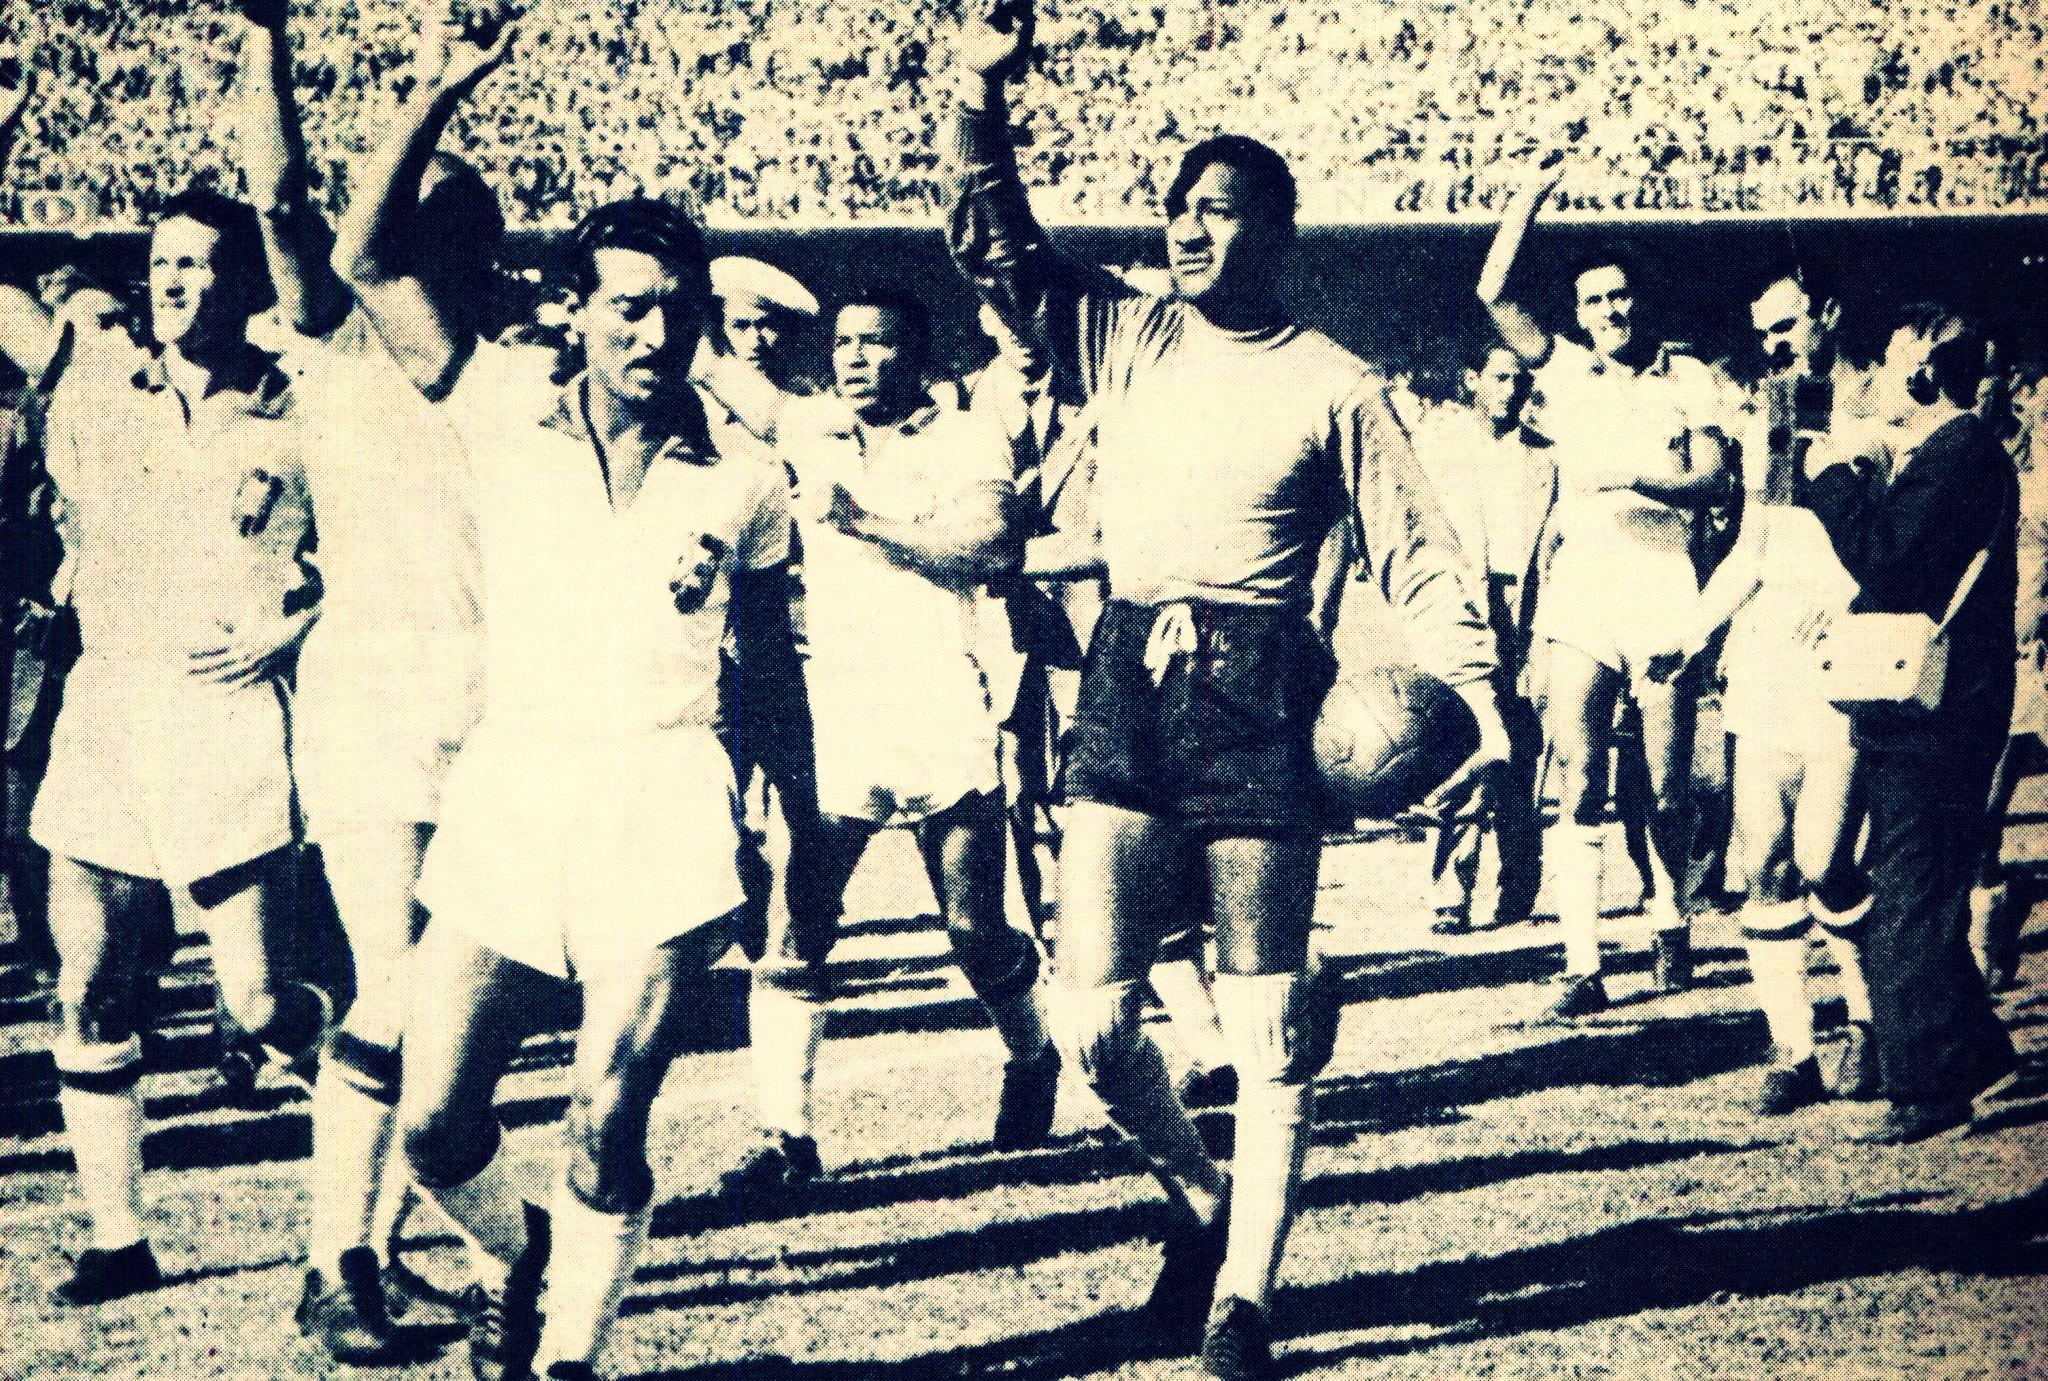 1950-fifa-world-cup-brazil-ball-superball-brazil-spain-1384743087.jpg